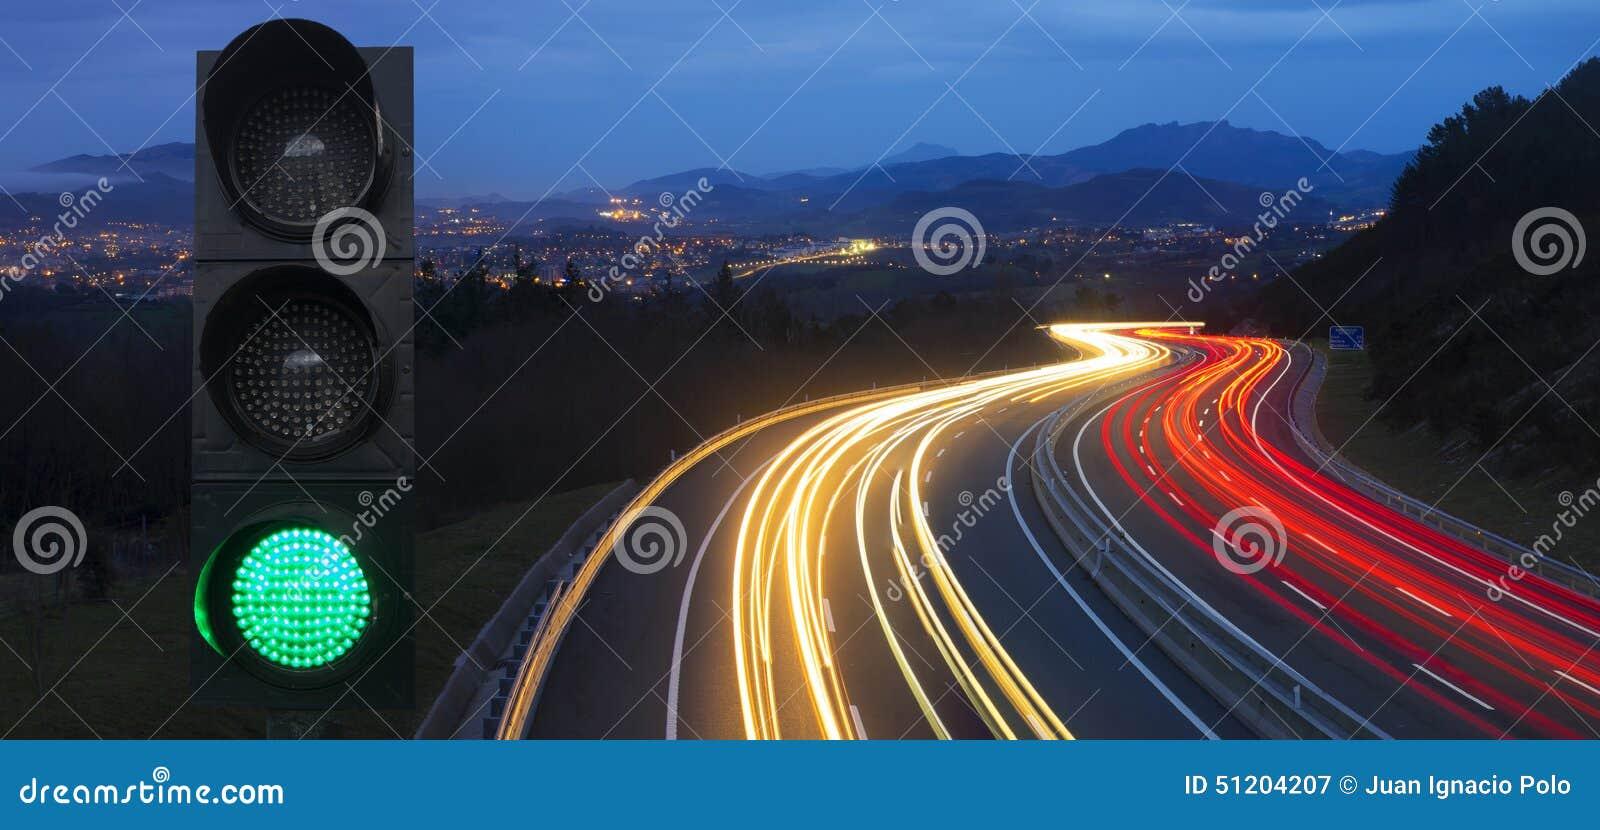 Traffic lights and car lights at night